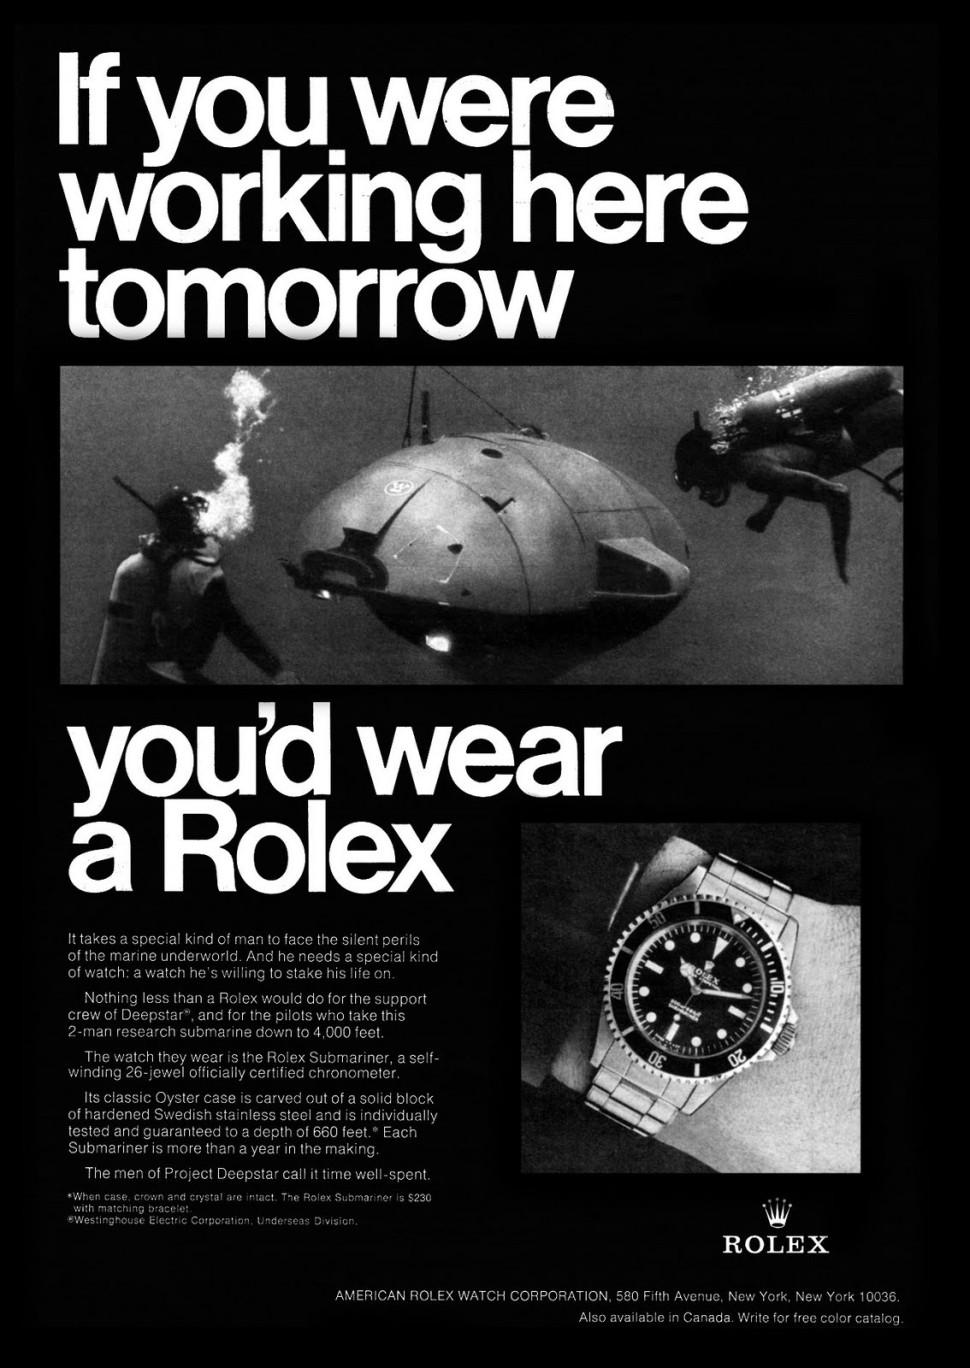 181011-rolex-ad-deepstar-4000-1968